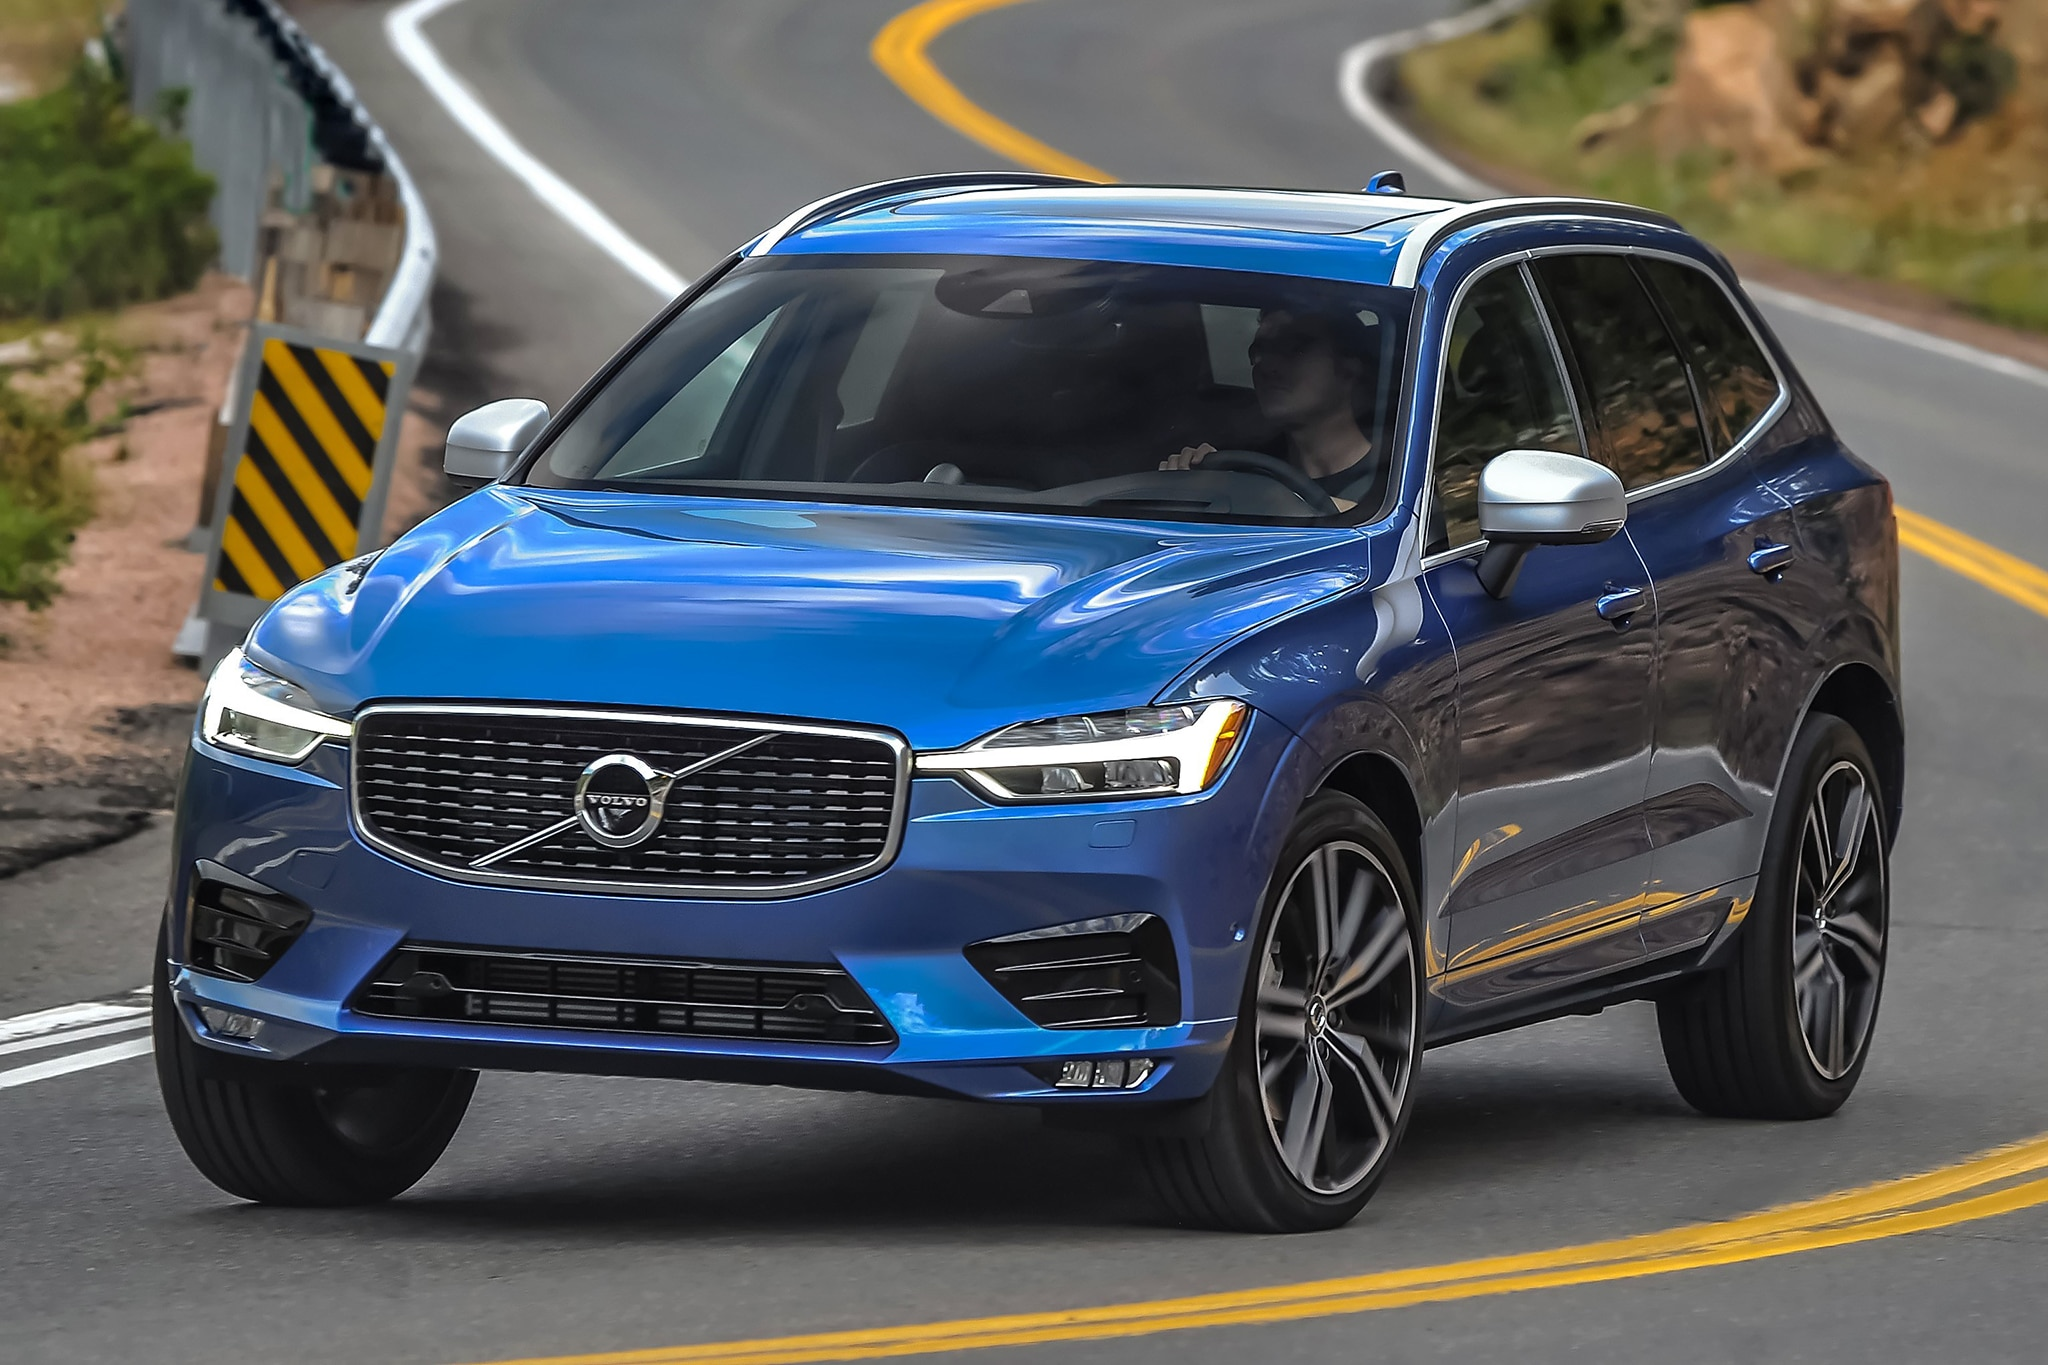 2018 Volvo XC60 T8 R Design Front Three Quarter In Motion 02 1